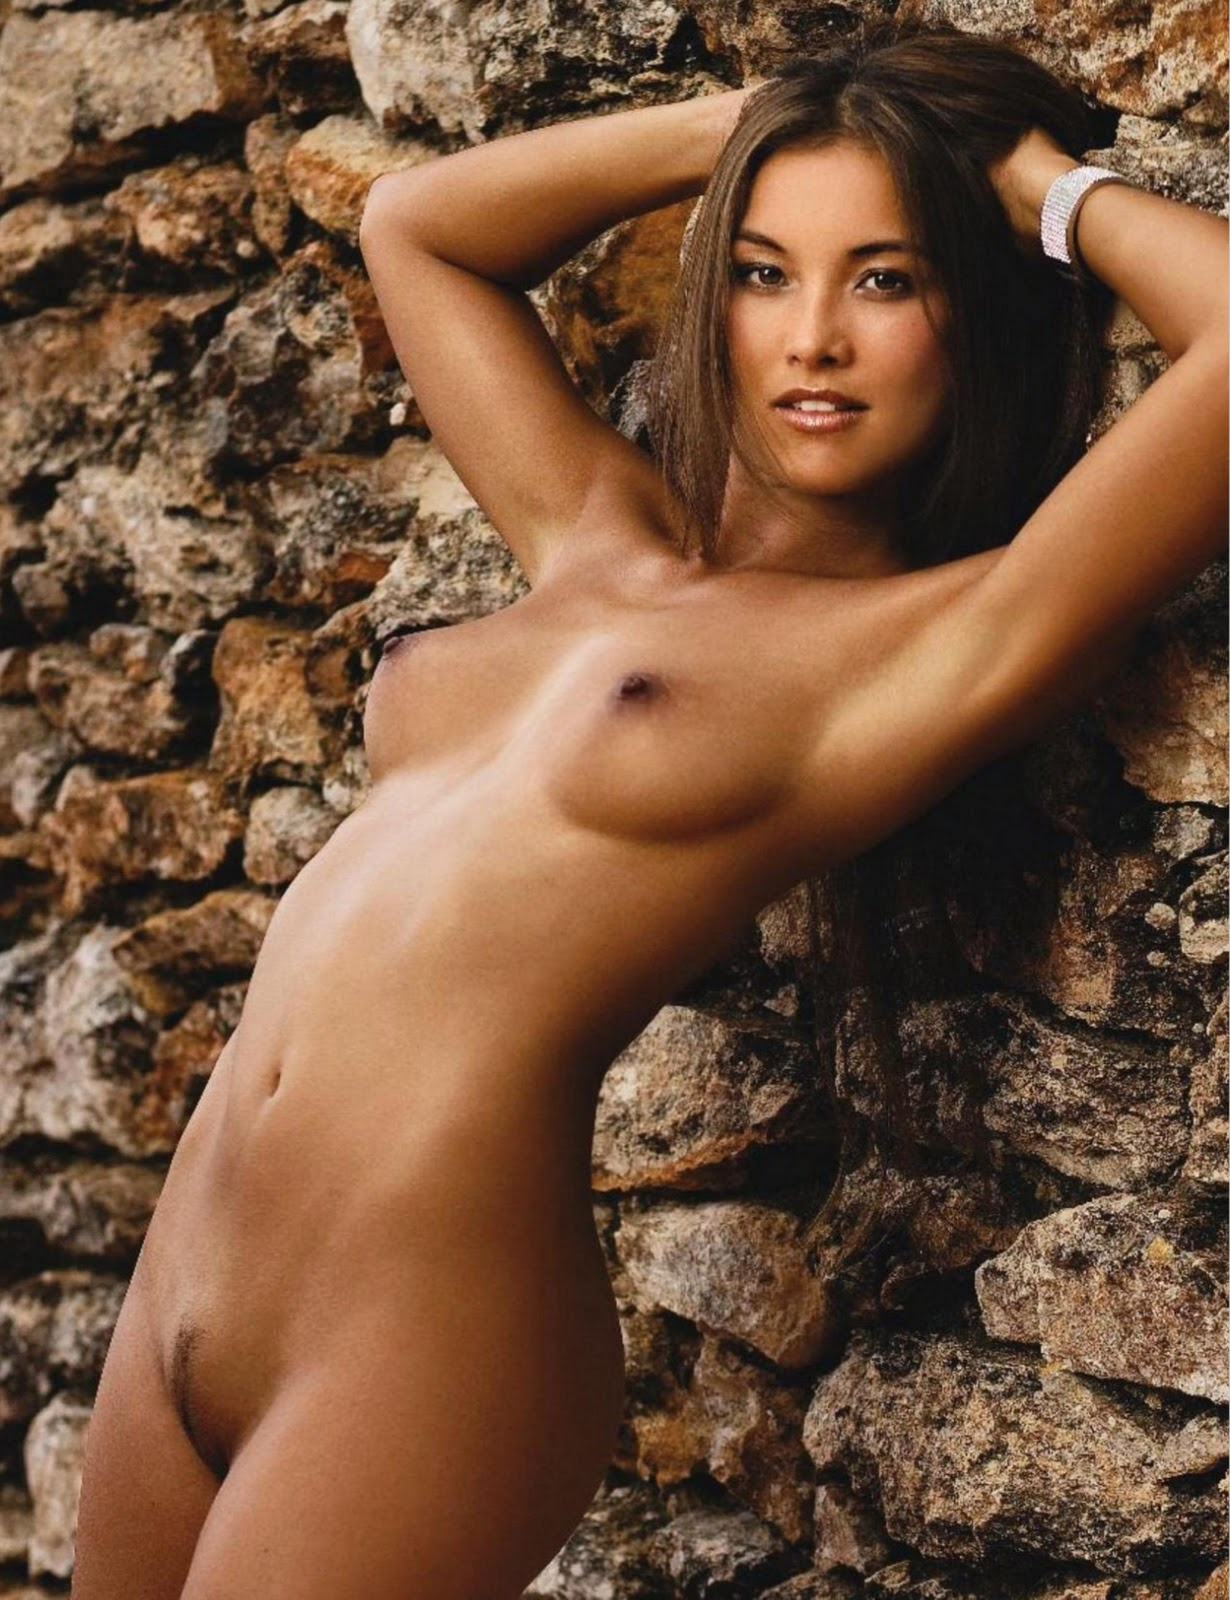 Big tits with huge dark areolas